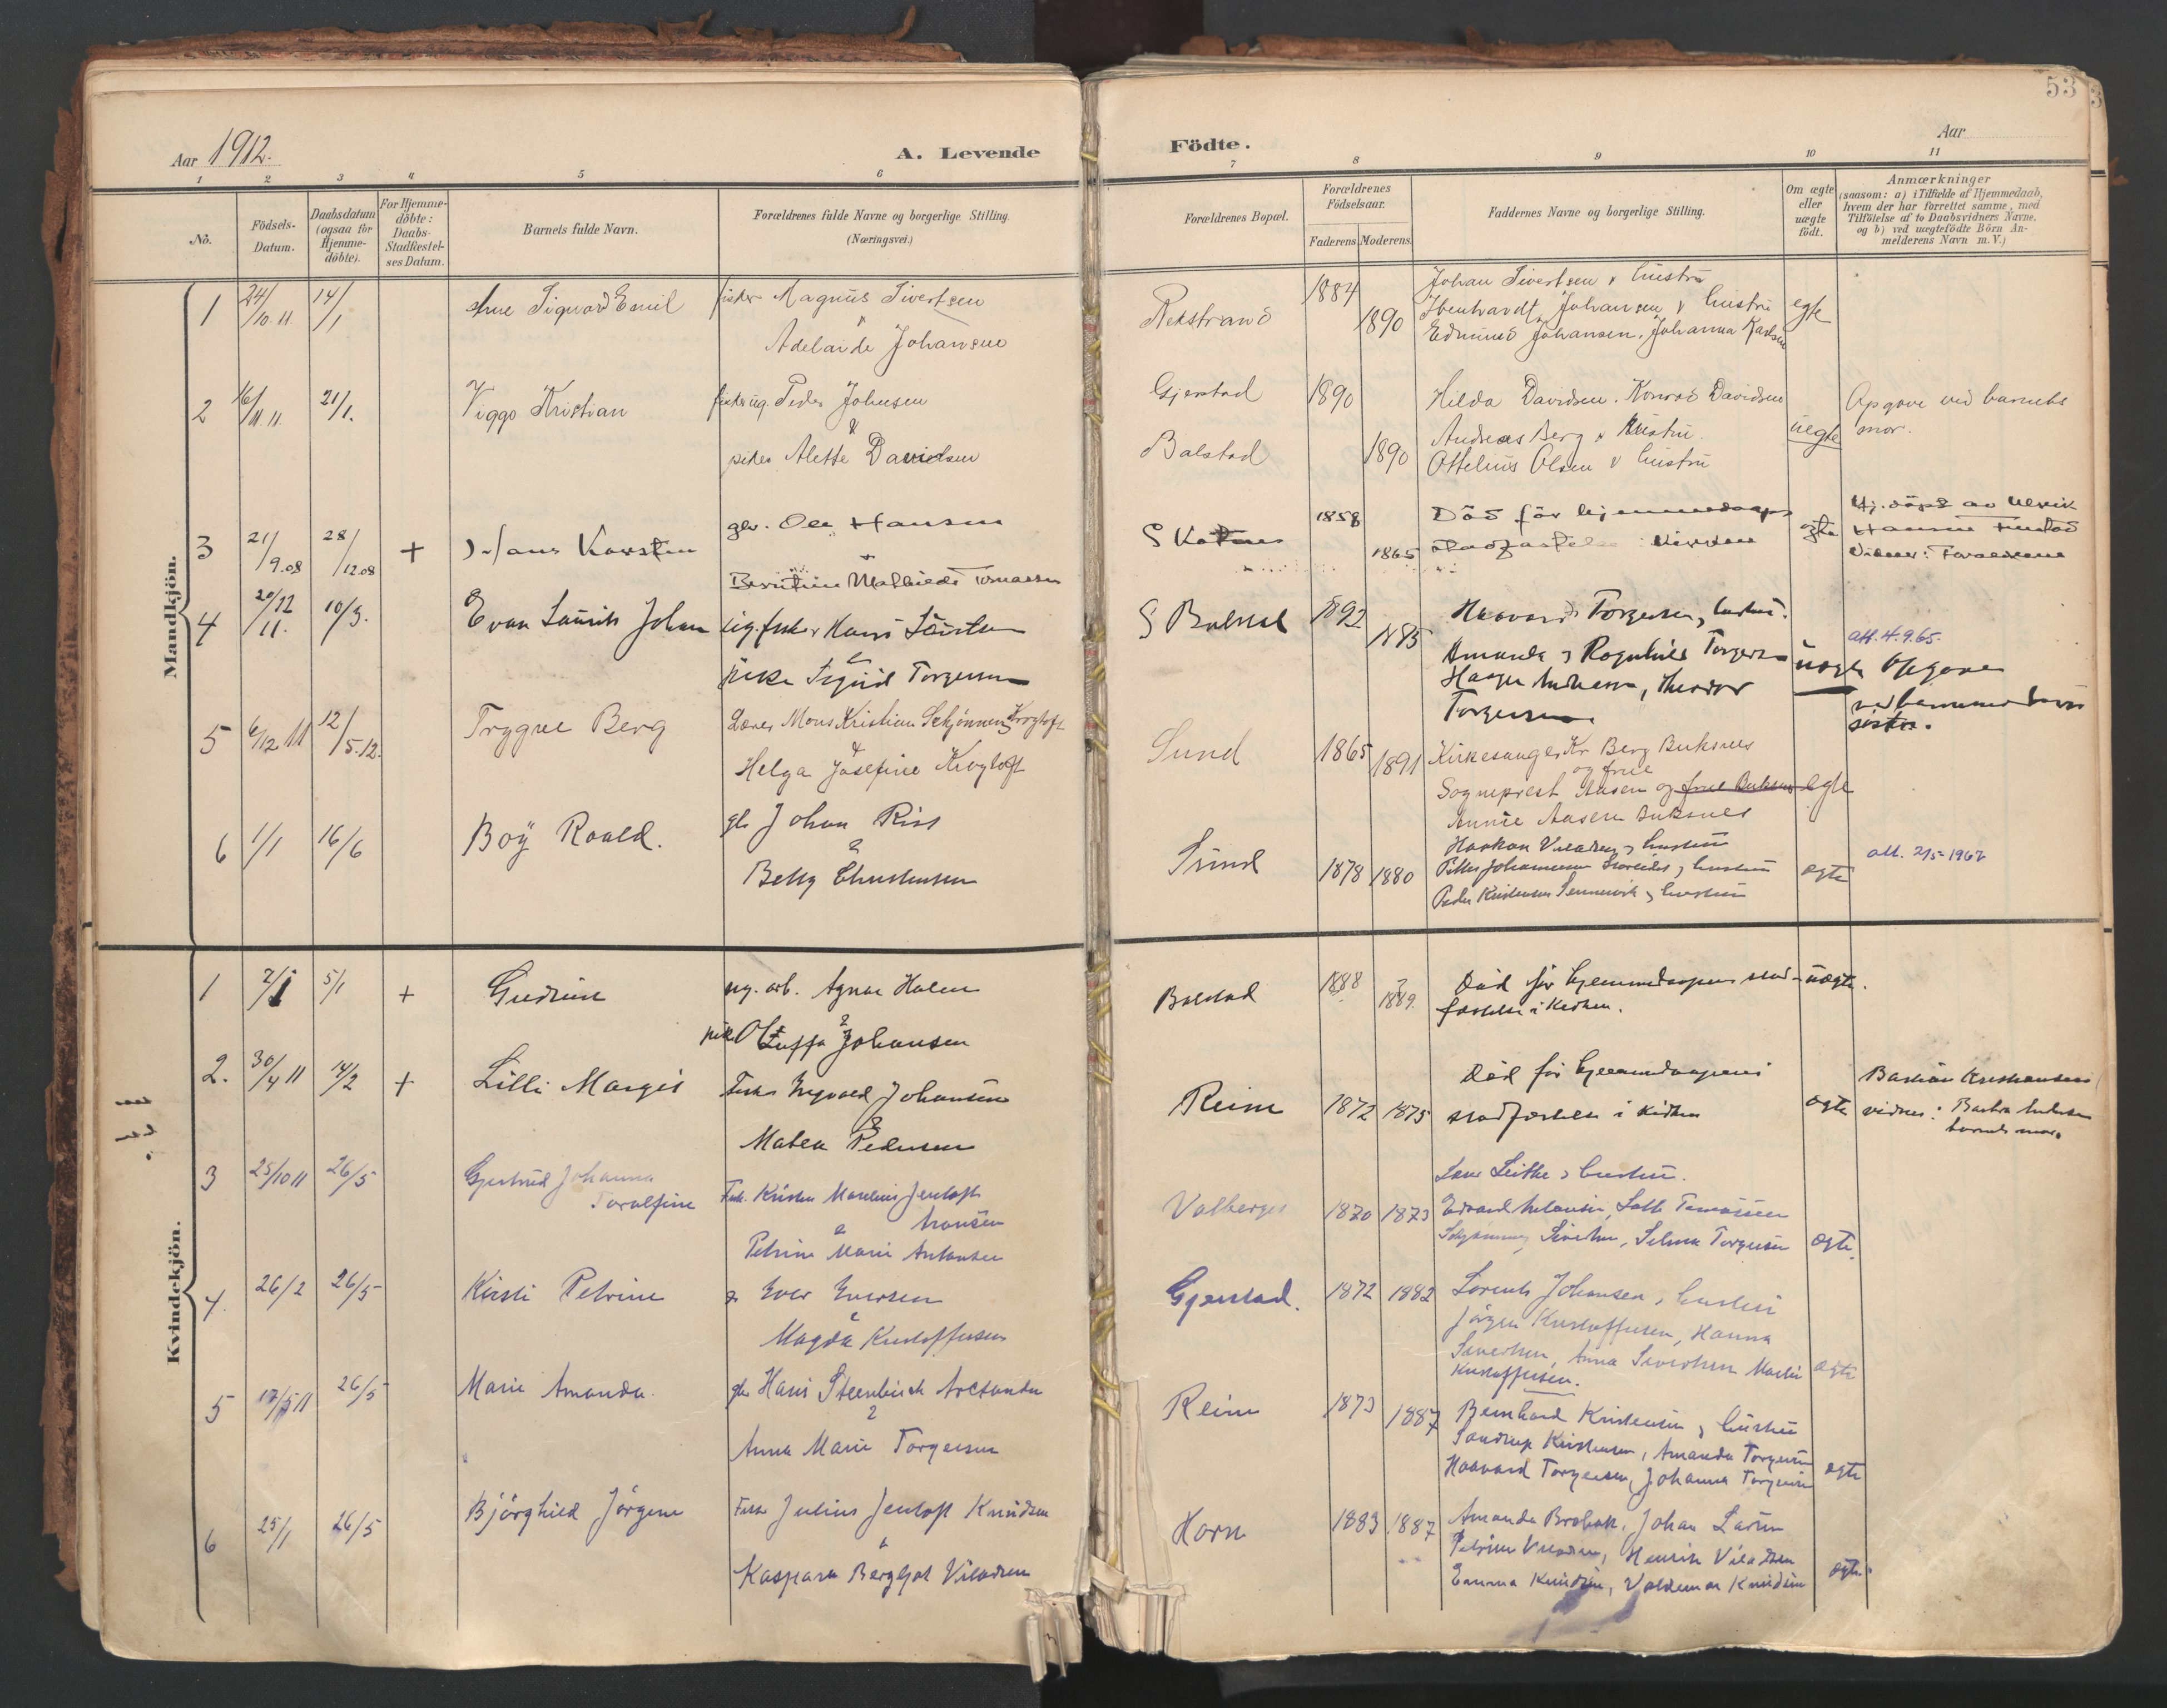 SAT, Ministerialprotokoller, klokkerbøker og fødselsregistre - Nordland, 881/L1154: Ministerialbok nr. 881A07, 1907-1918, s. 53